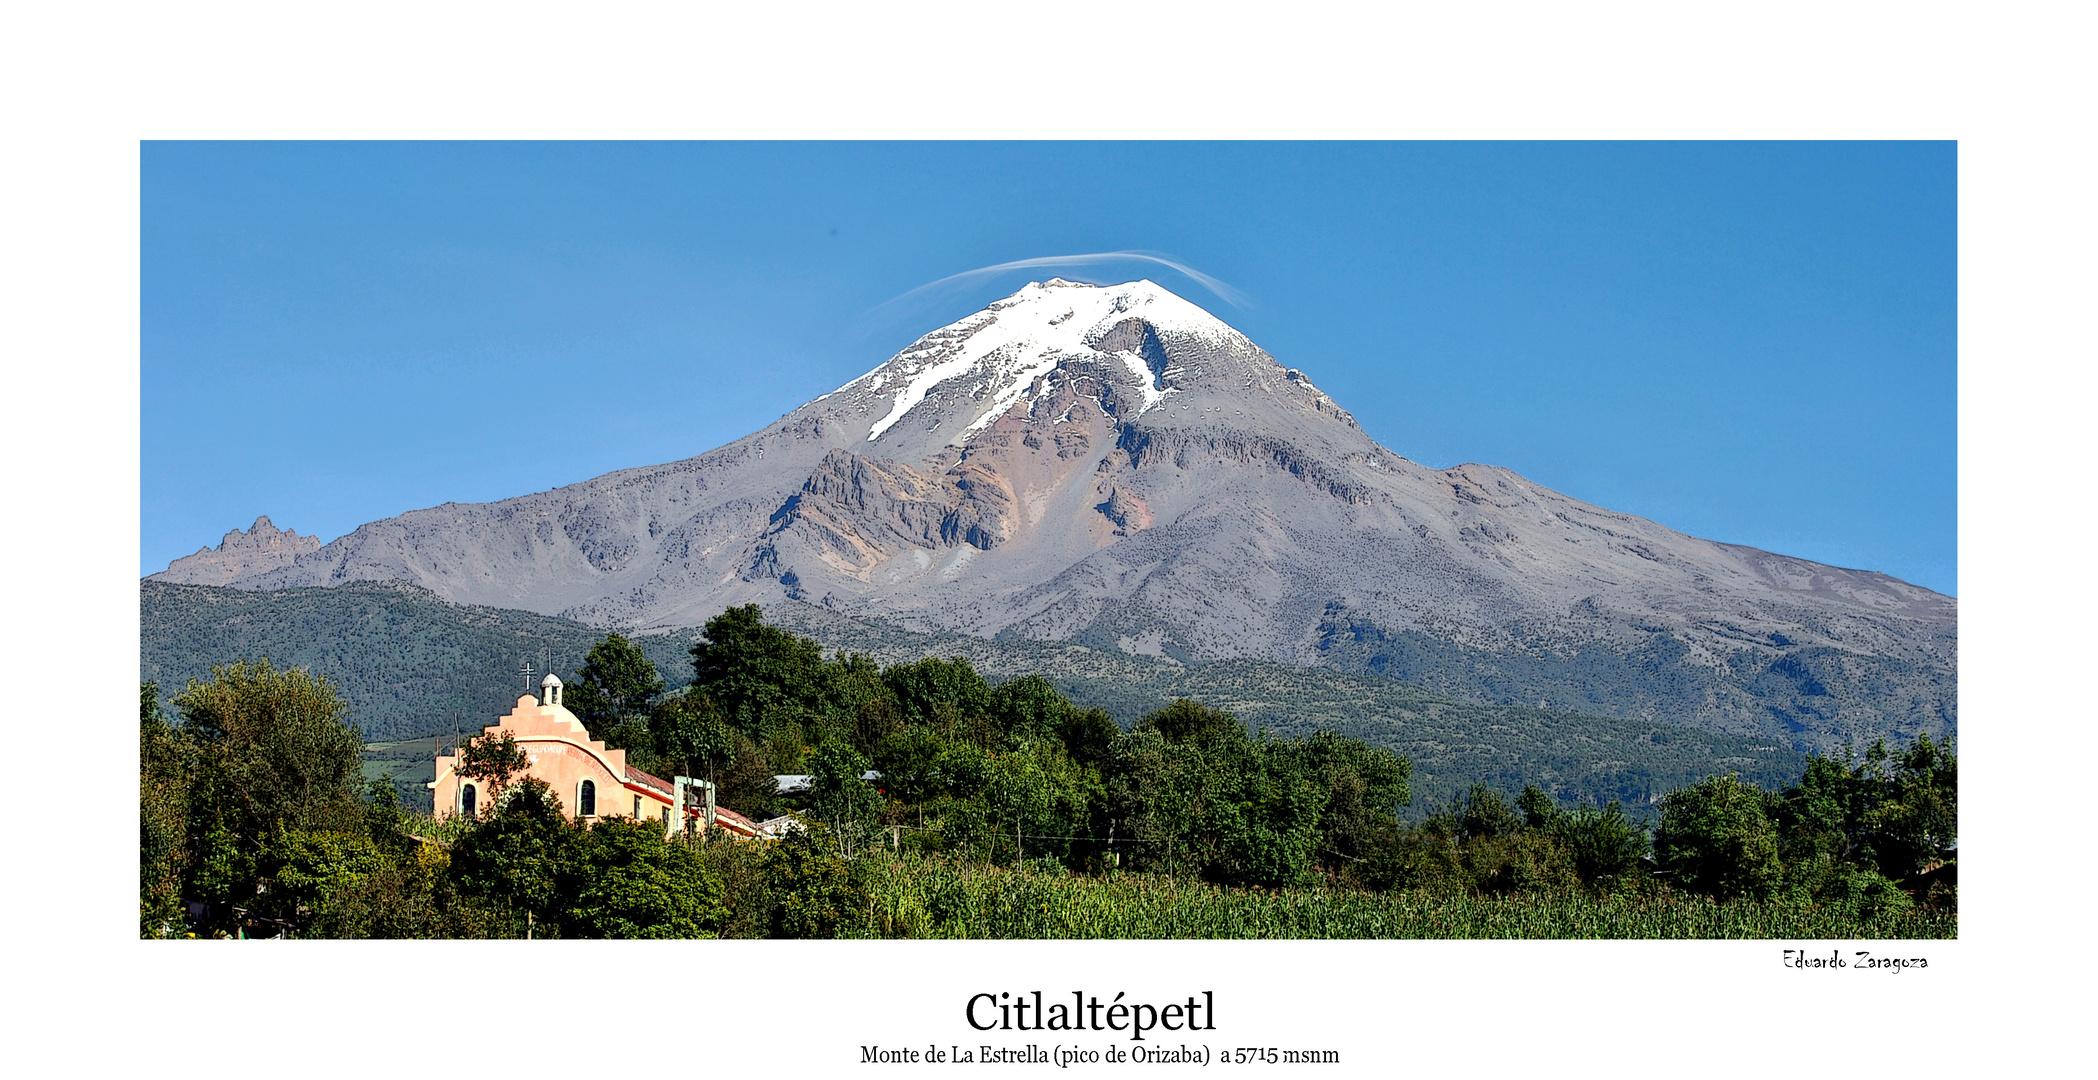 Citlaltépetl (Monte de la Estrella)